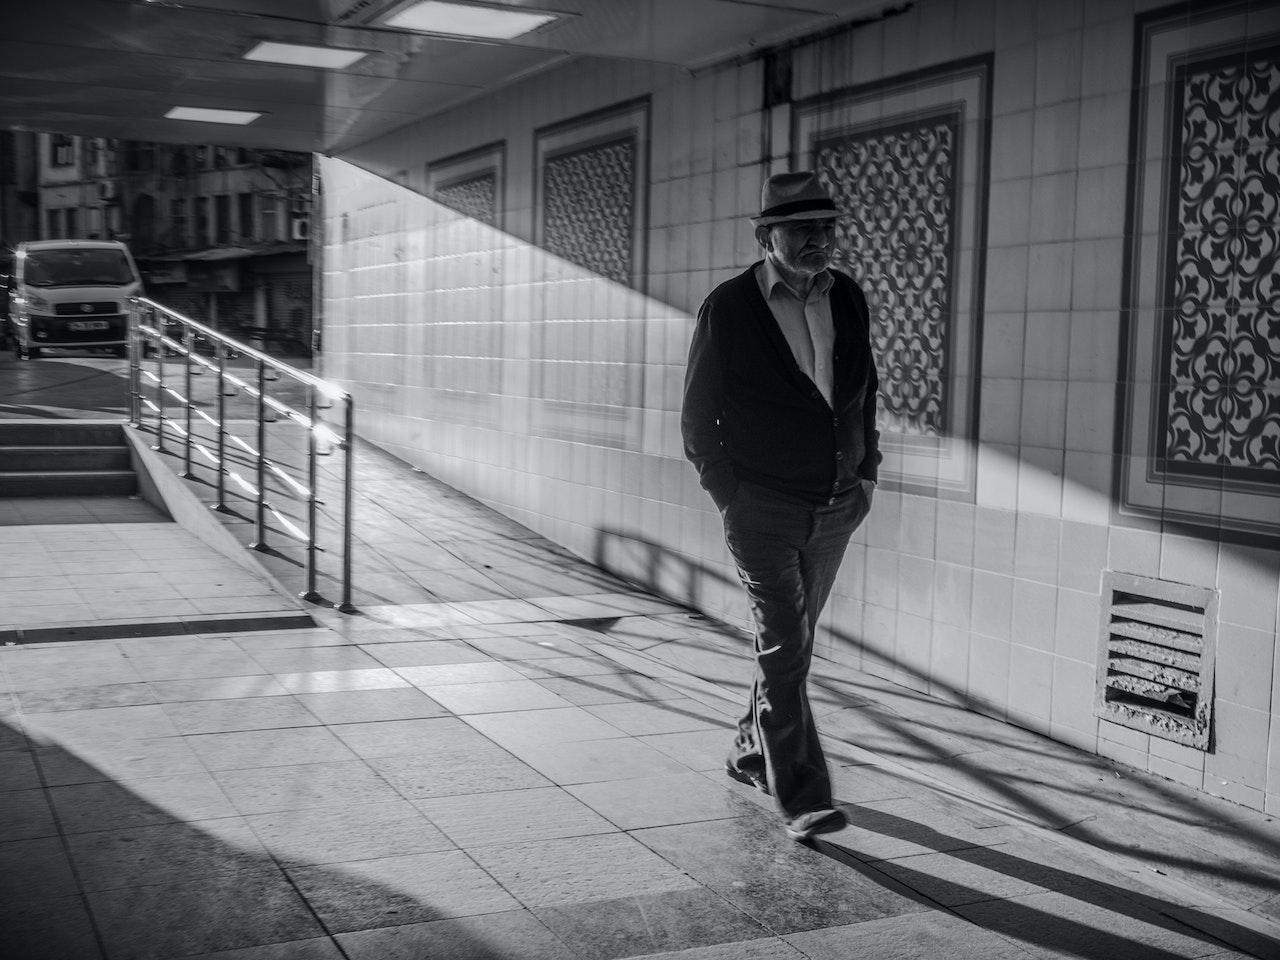 OldMan-with-hat-underground-crossway-small